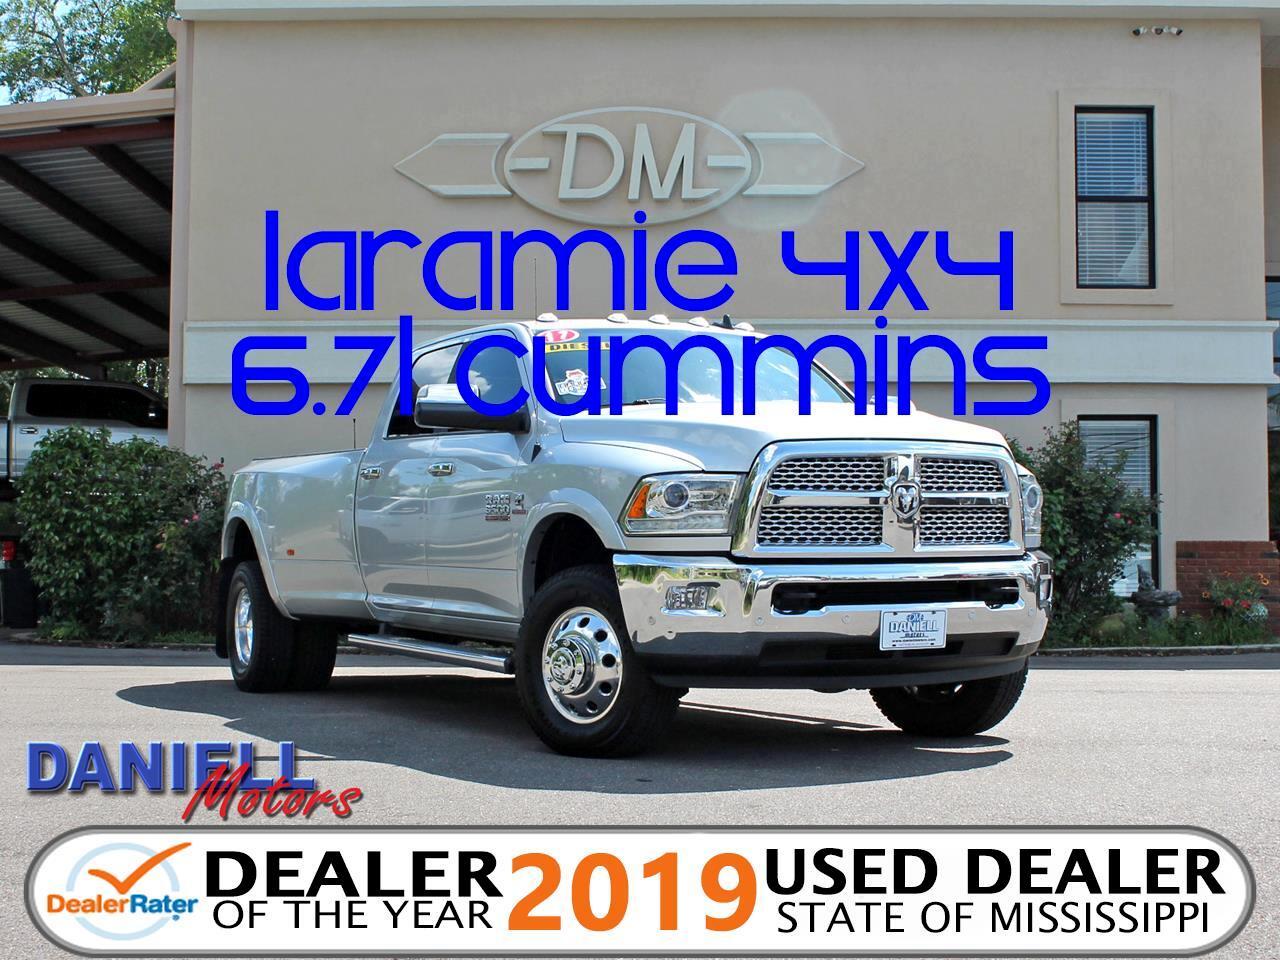 2017 RAM 3500 Laramie Crew Cab LWB 4WD DRW